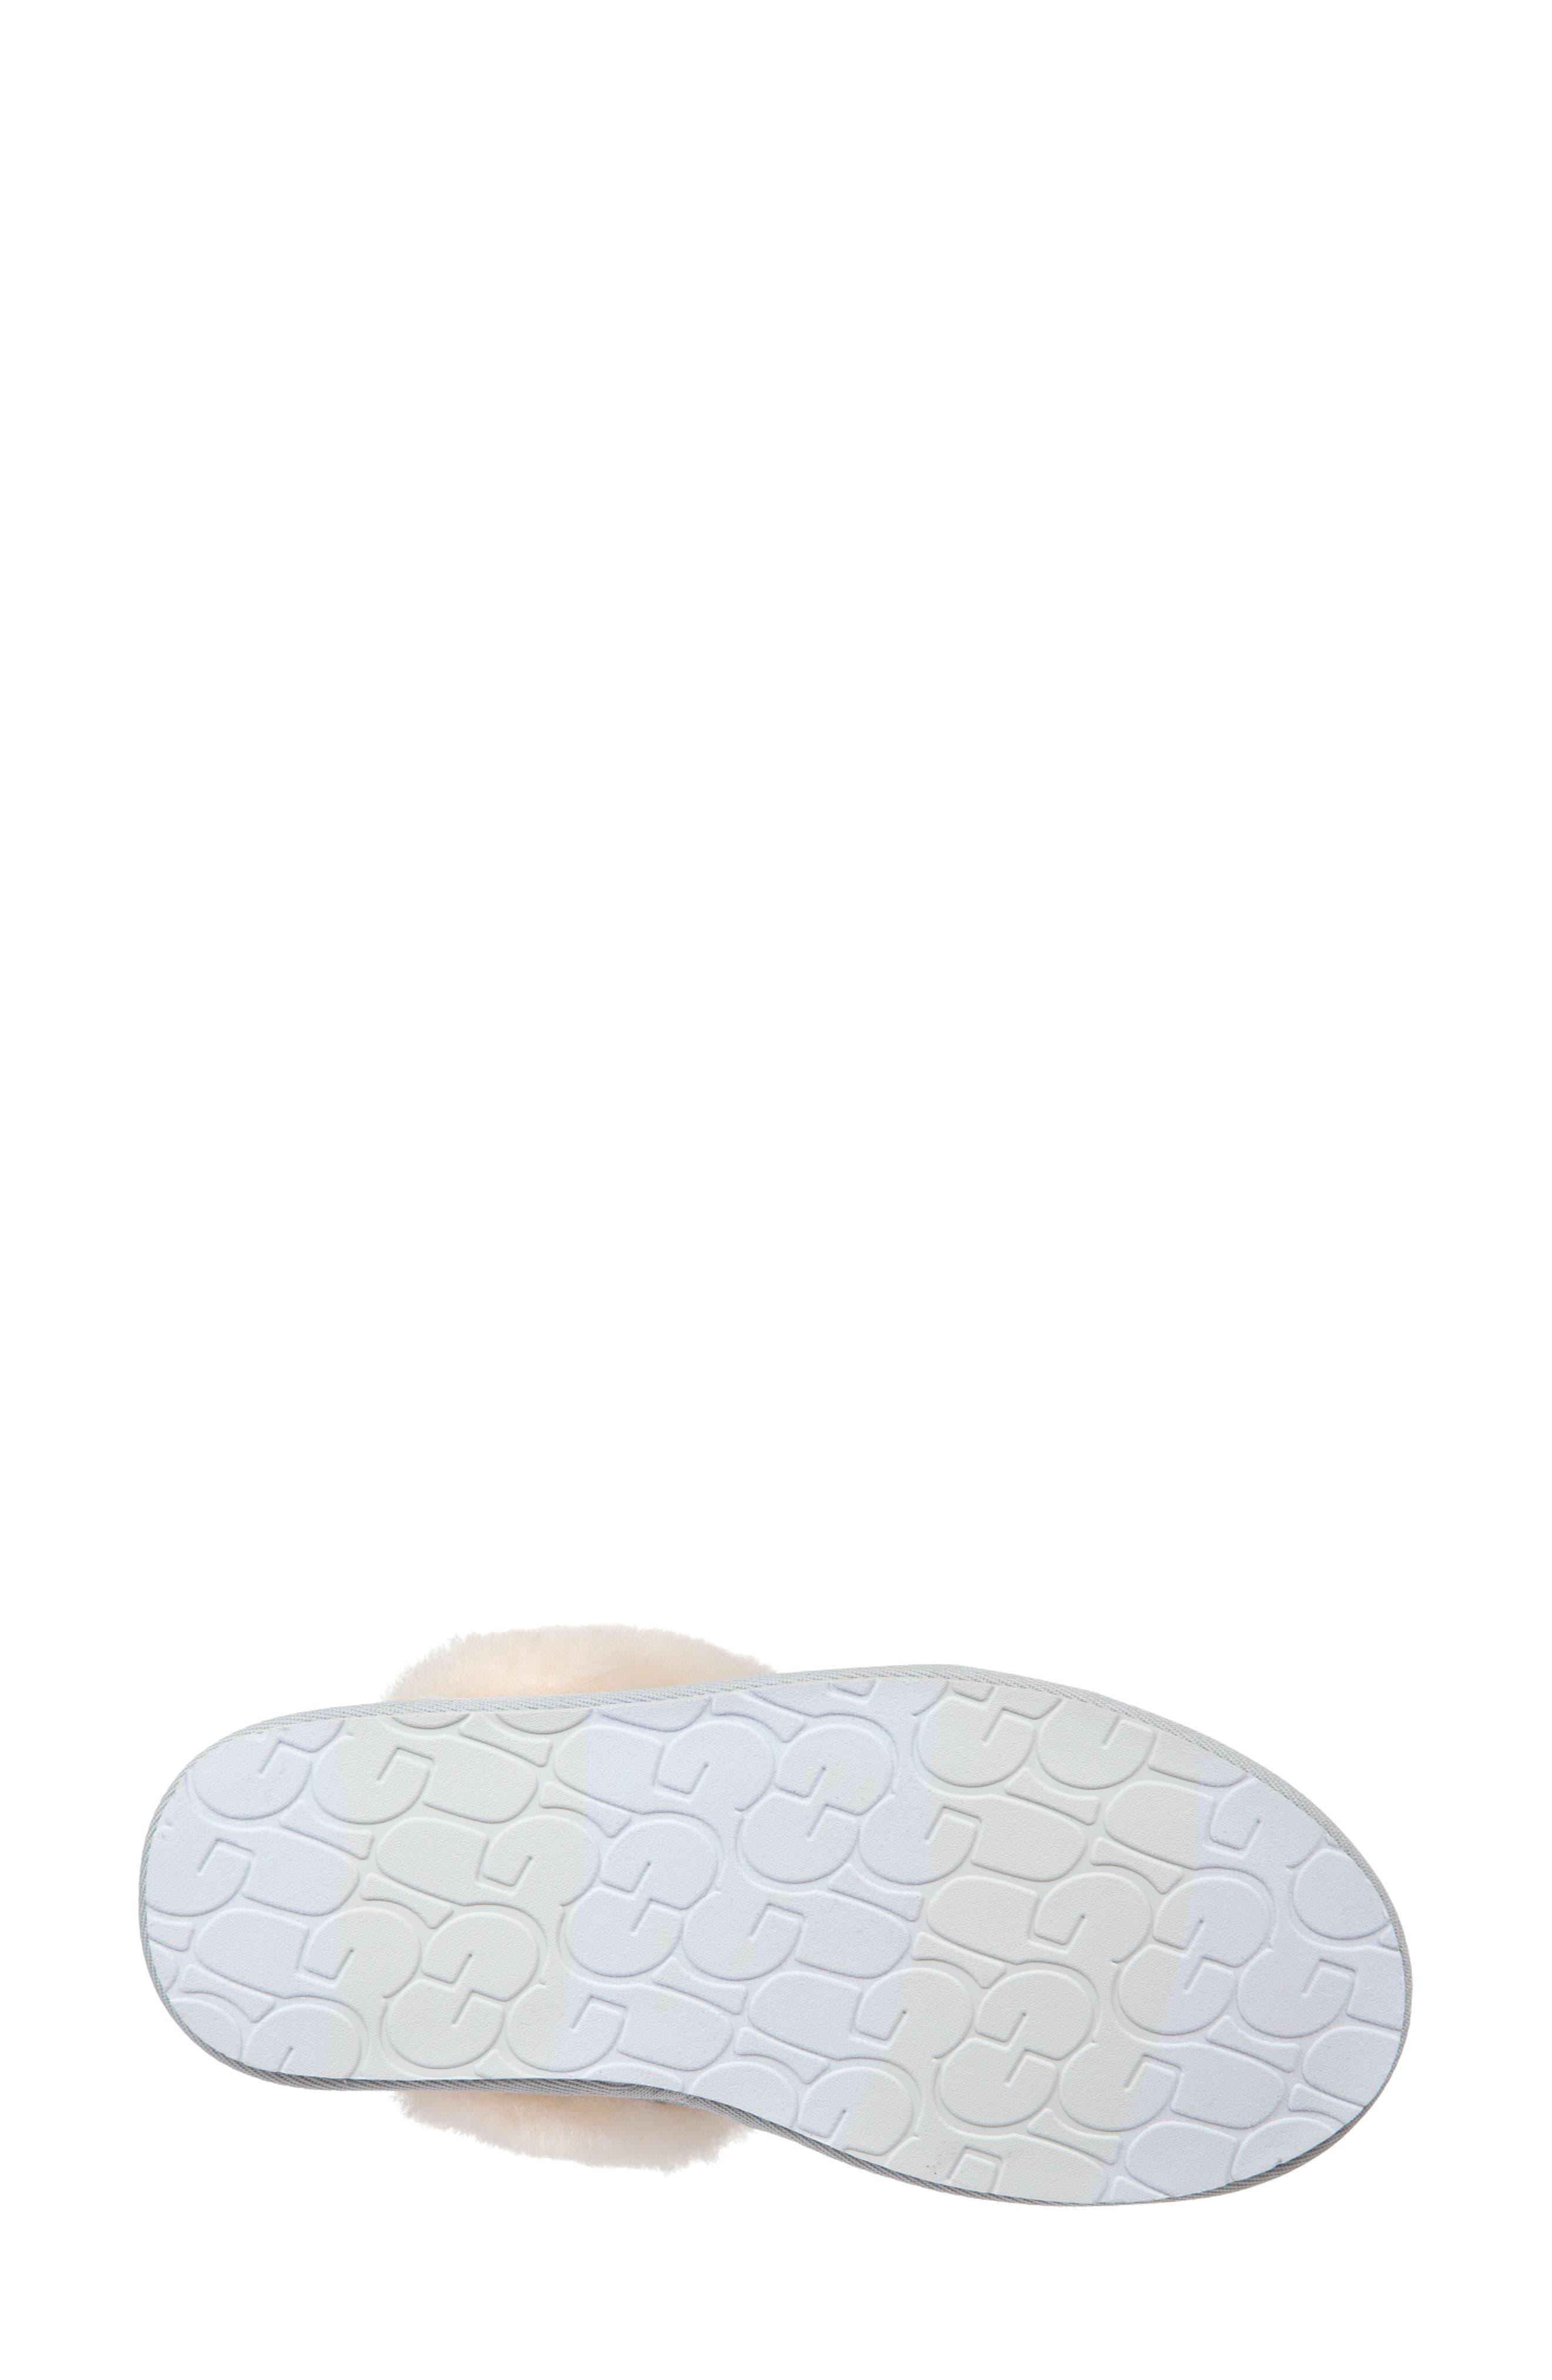 UGG<SUP>®</SUP>, Scuffette II Sparkle Genuine Shearling Slipper, Alternate thumbnail 5, color, SILVER